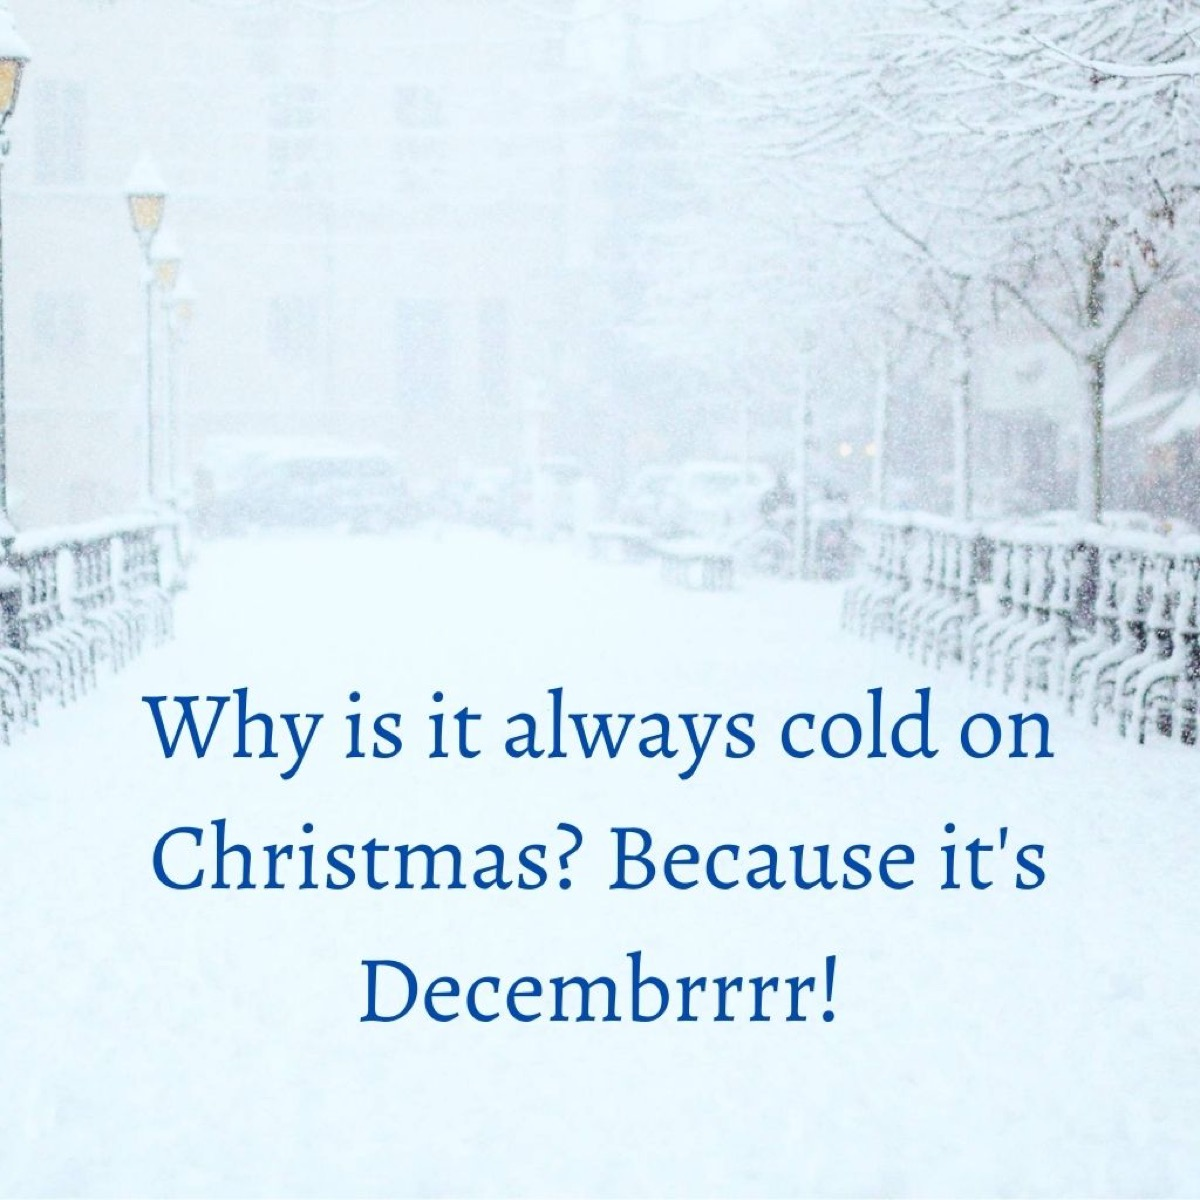 Image of a Christmas joke